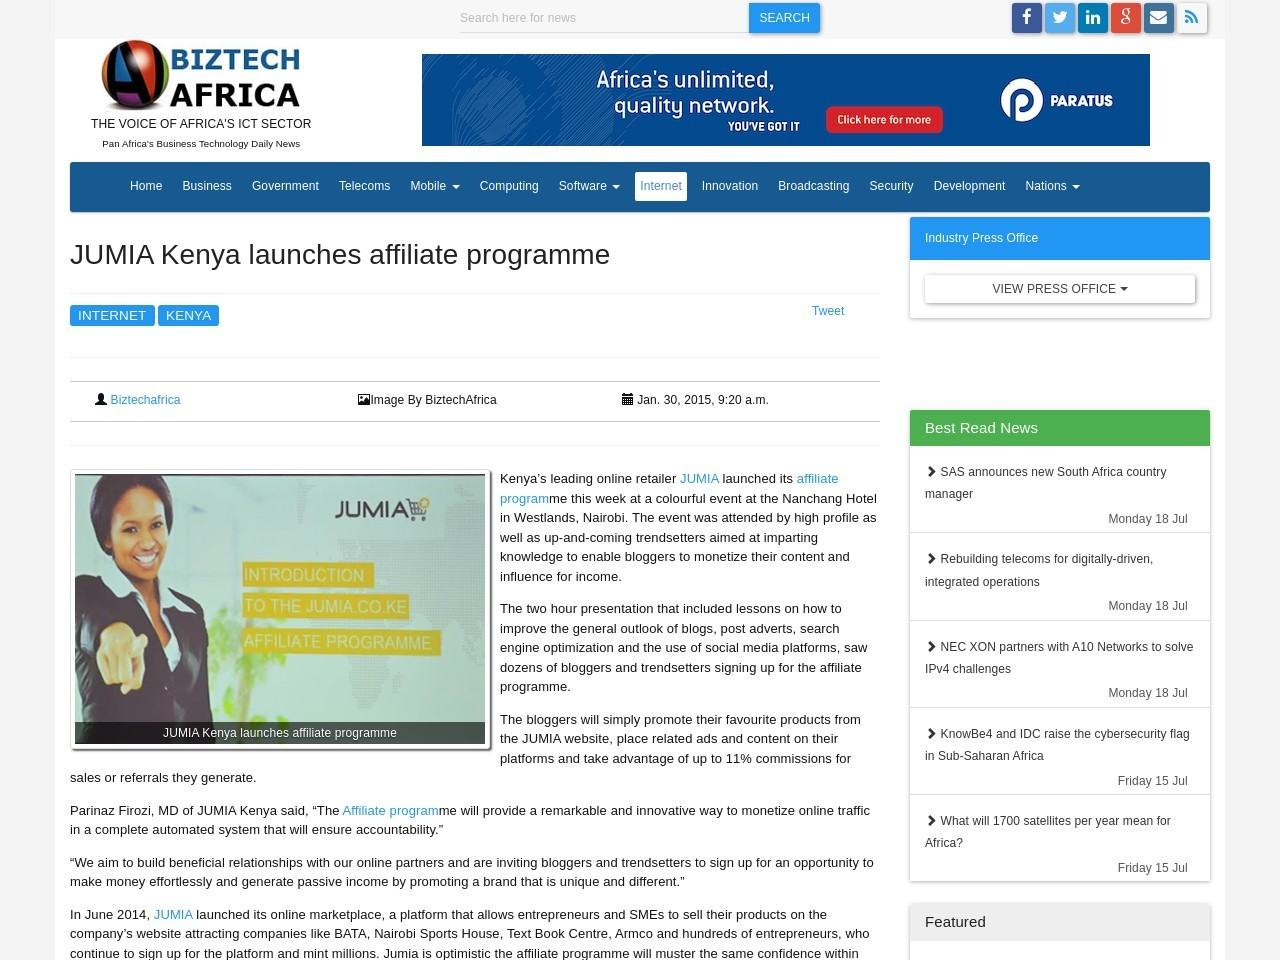 JUMIA Kenya launches affiliate programme